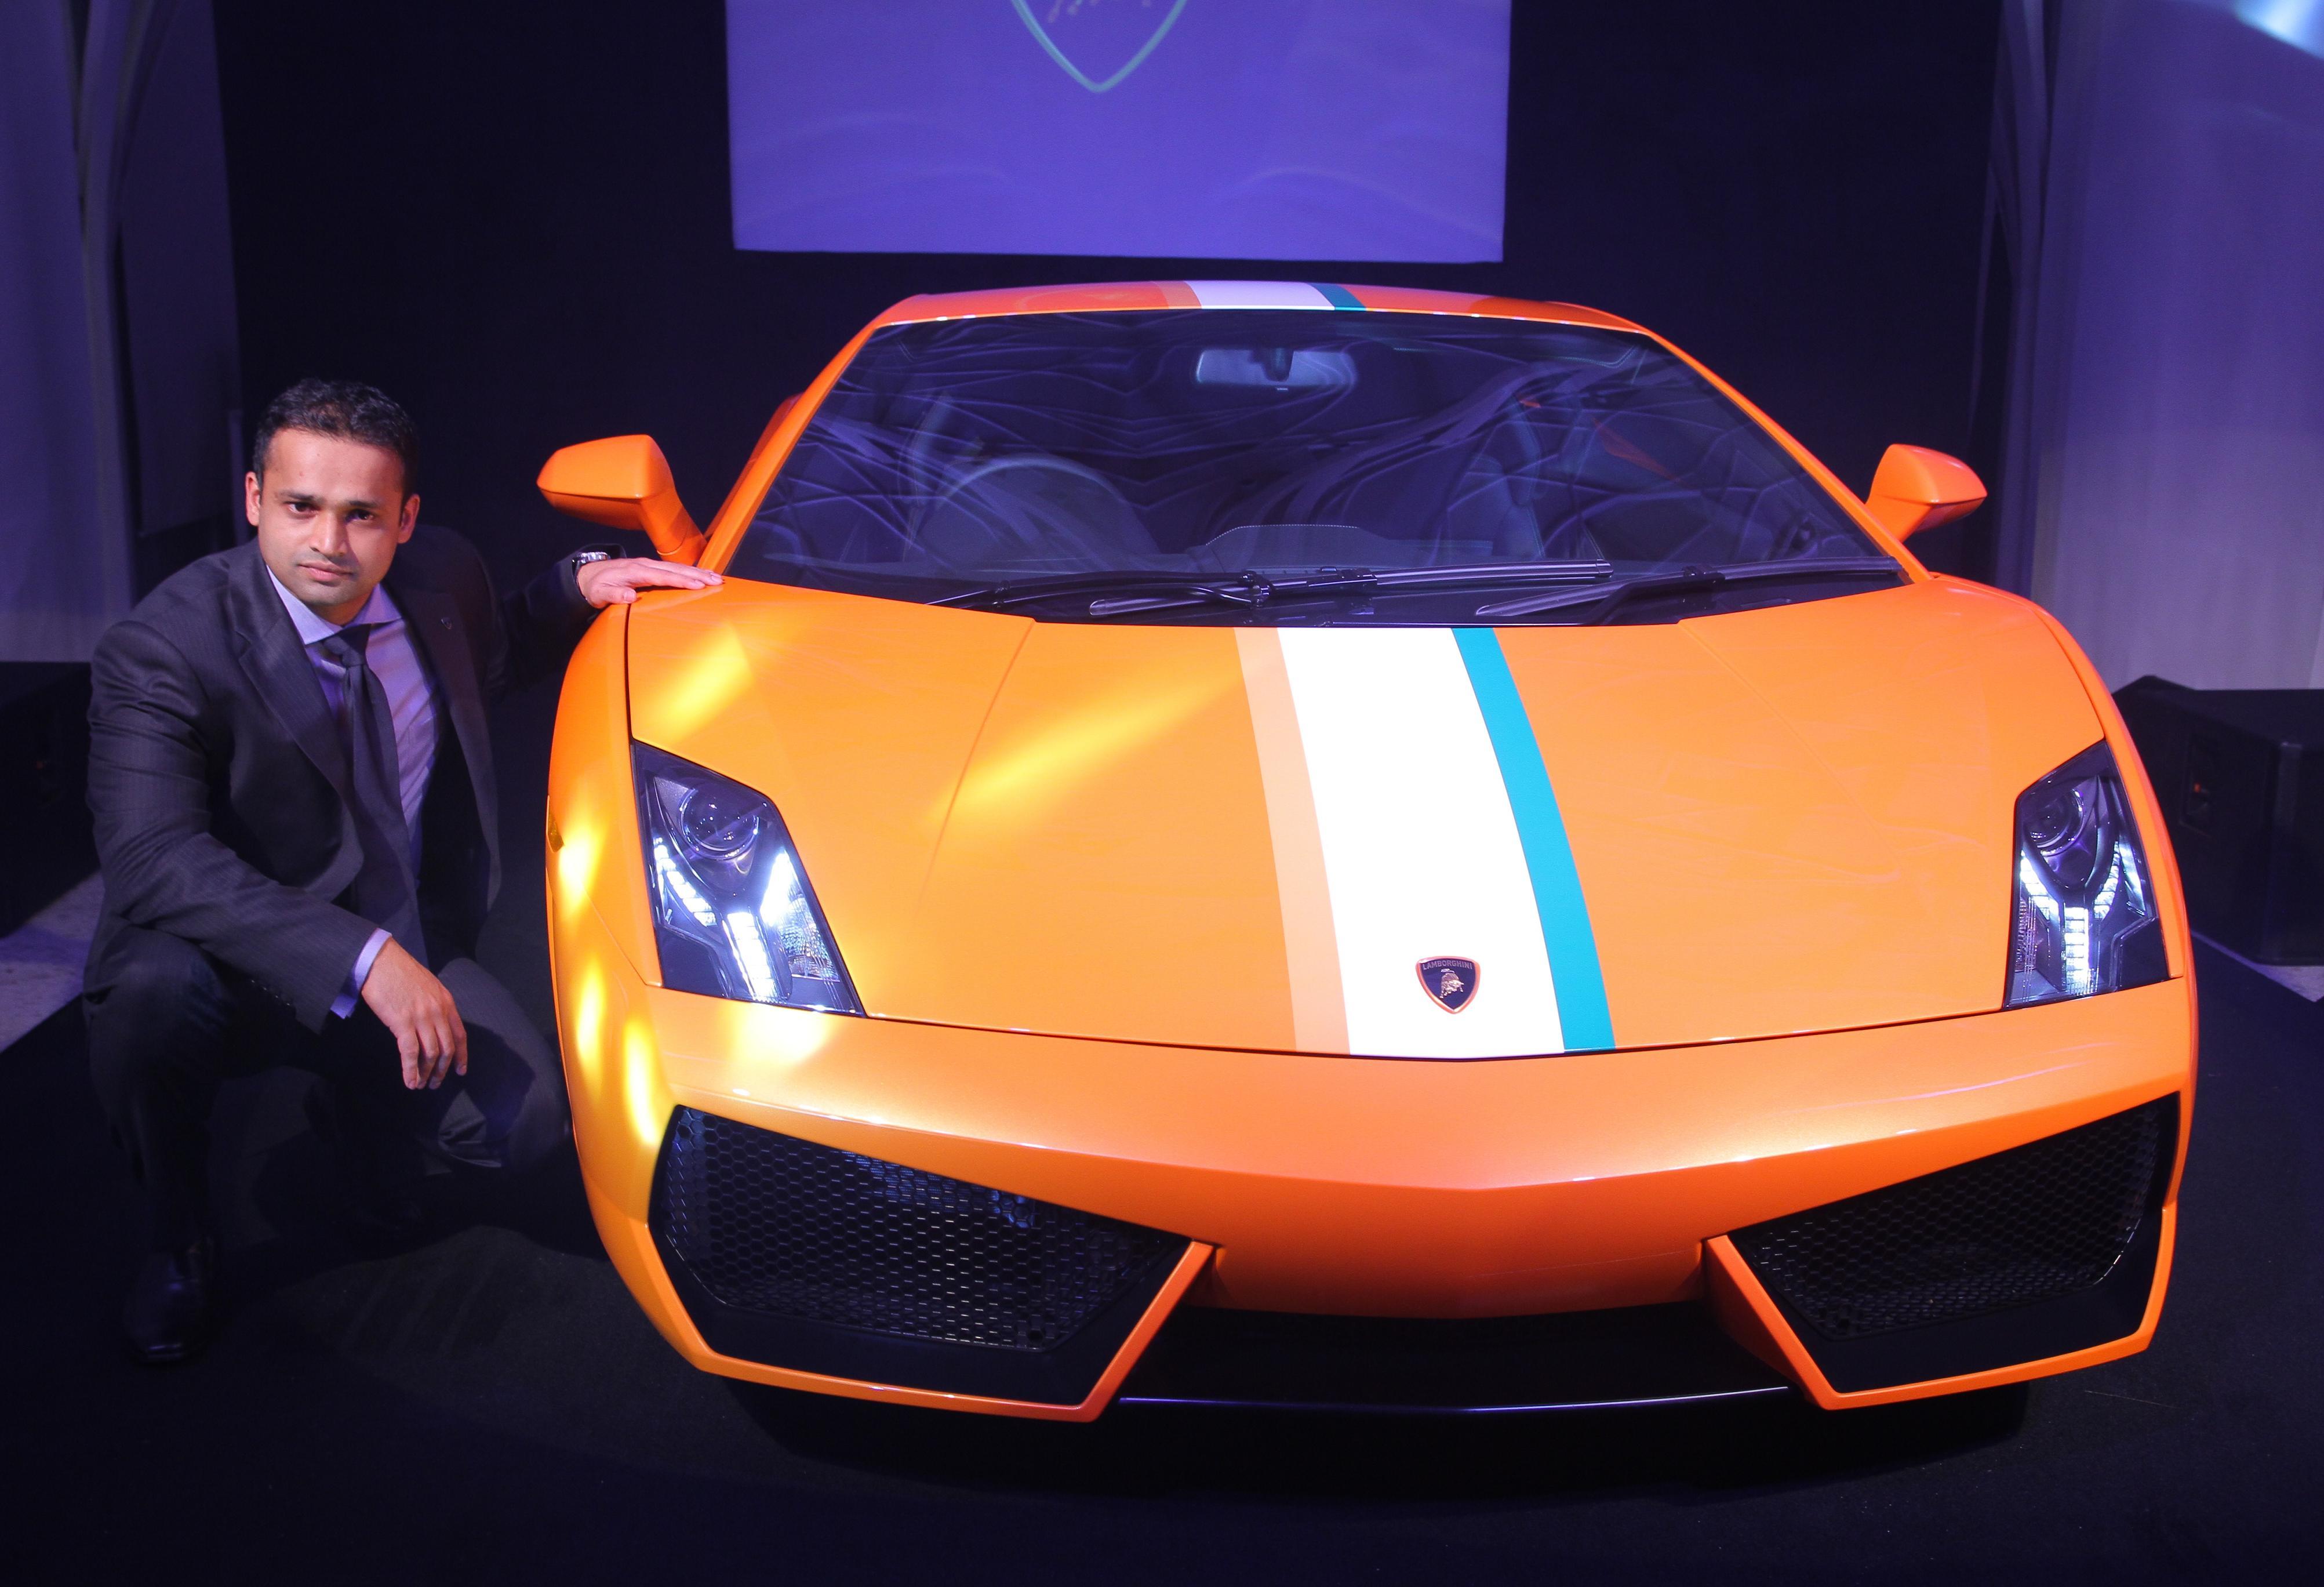 Lamborghini Gallardo Lp550 2 India Limited Edition Launched